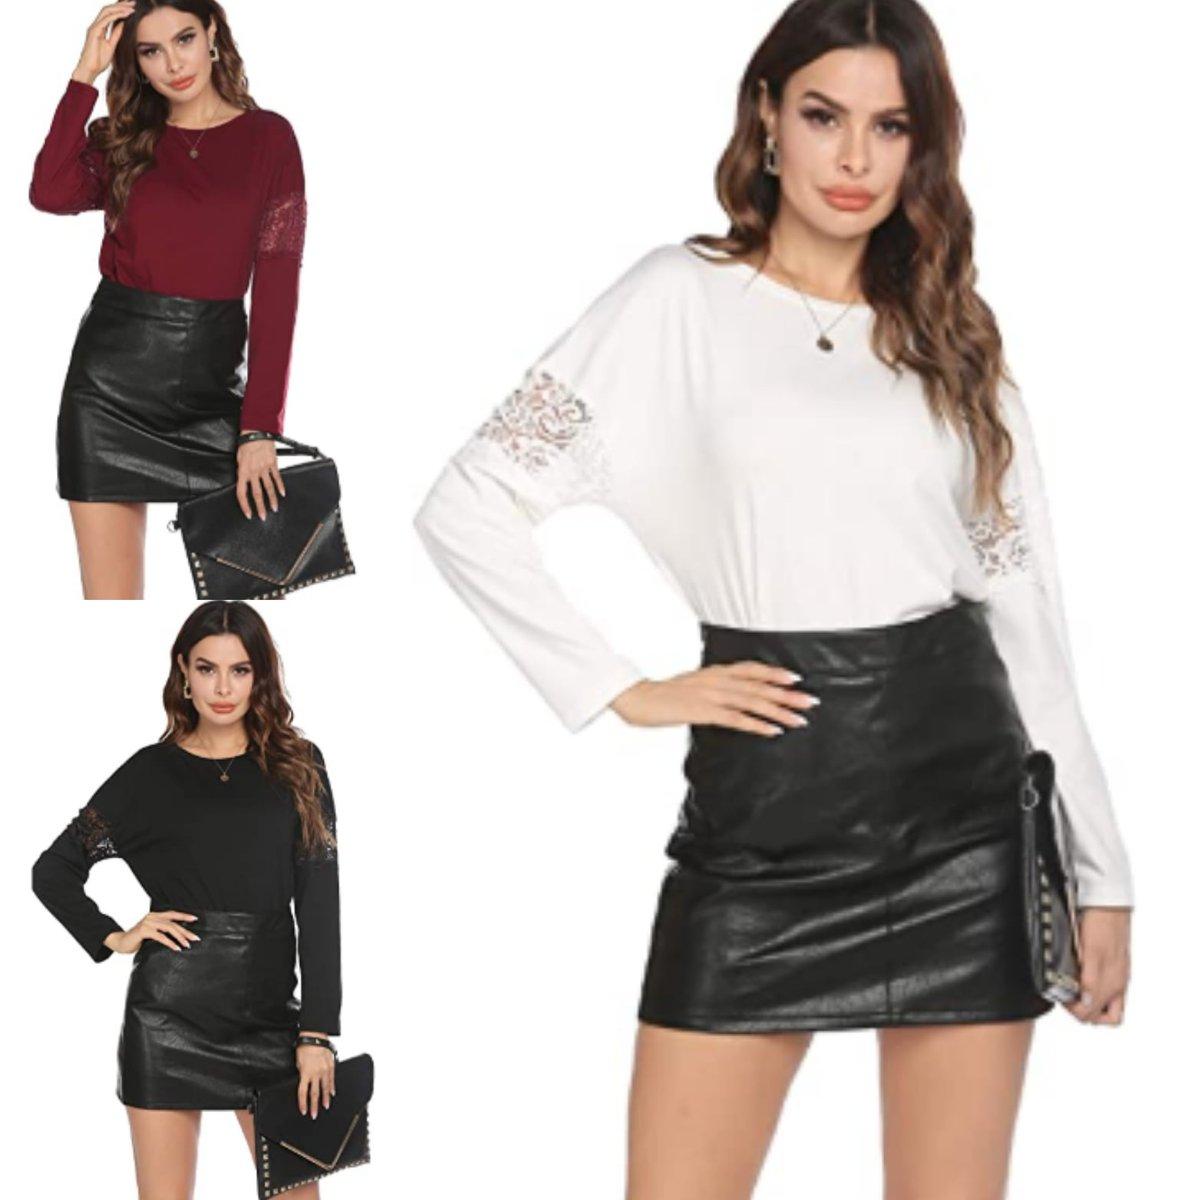 #whatyouwear #MATTER #fashion #popular #power #Ladies #fashionstyle #Blouse #lace #elegant https://t.co/Y9DYFhd6pR